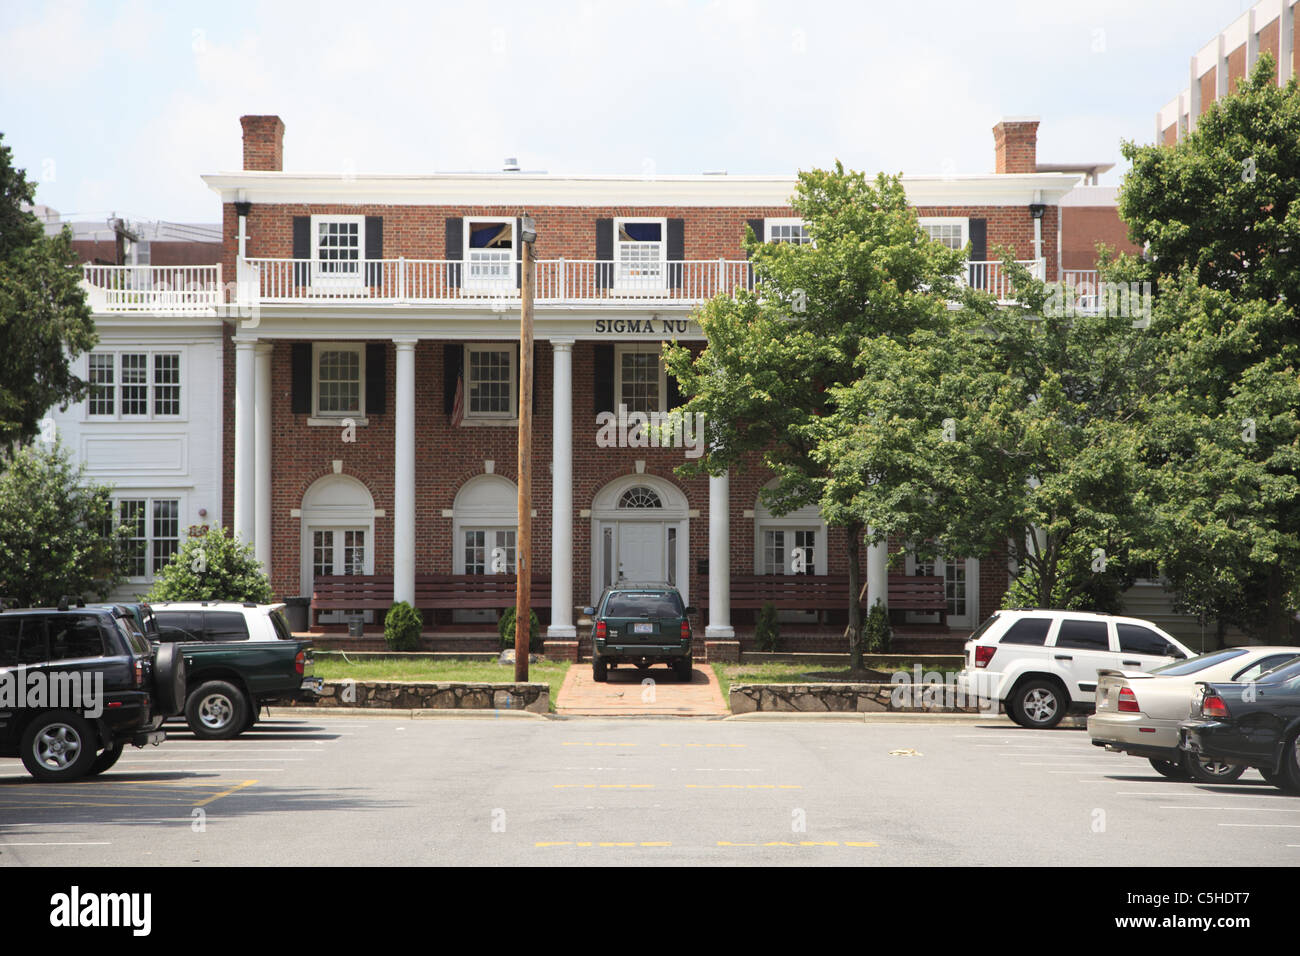 Fraternity House, University of North Carolina, Chapel Hill, USA Stock Photo